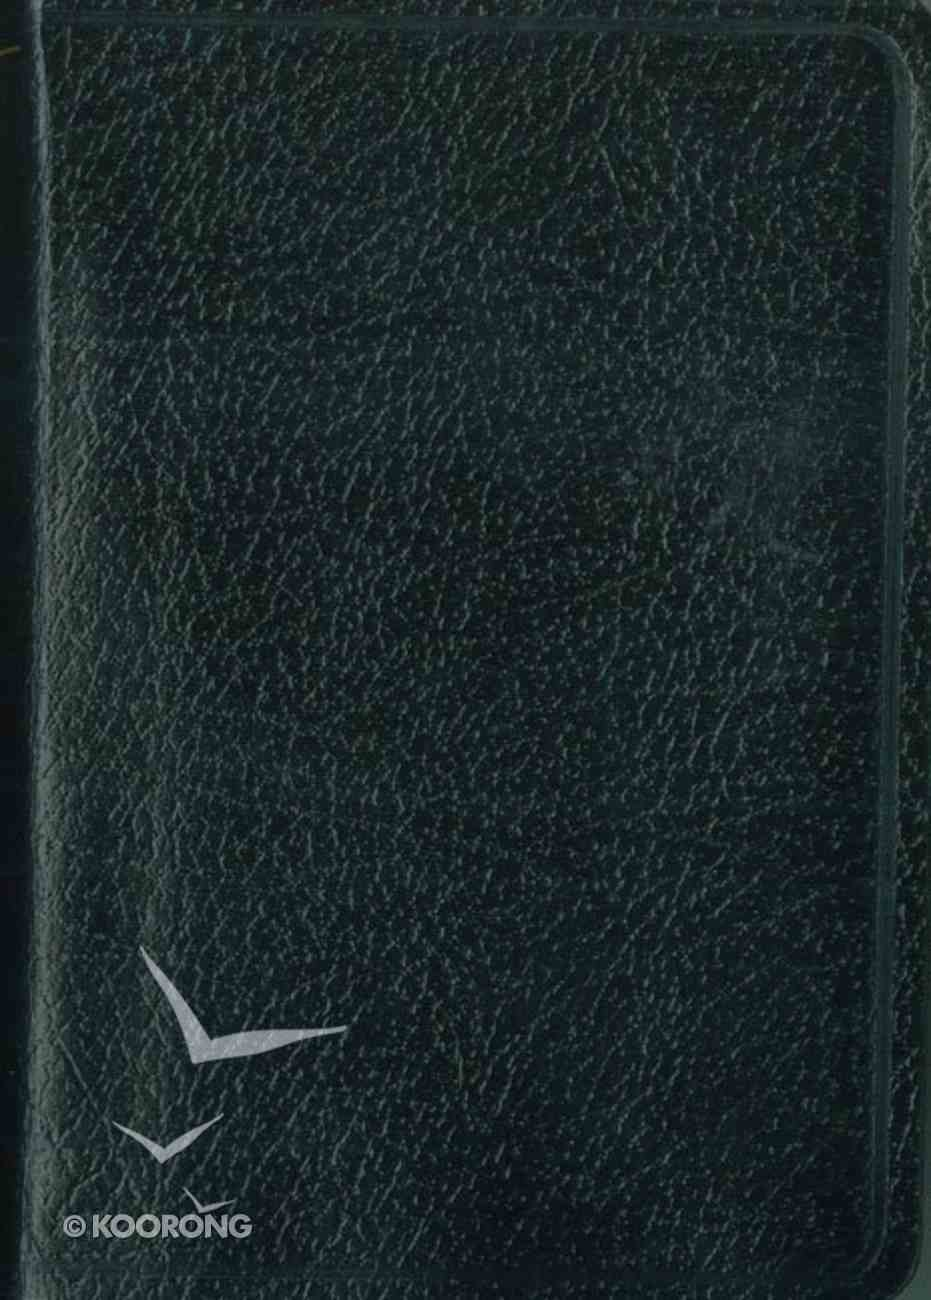 Nvi Biblia Bolsillo Spanish Nvi Compact Bible Black (Red Letter Edition) Imitation Leather